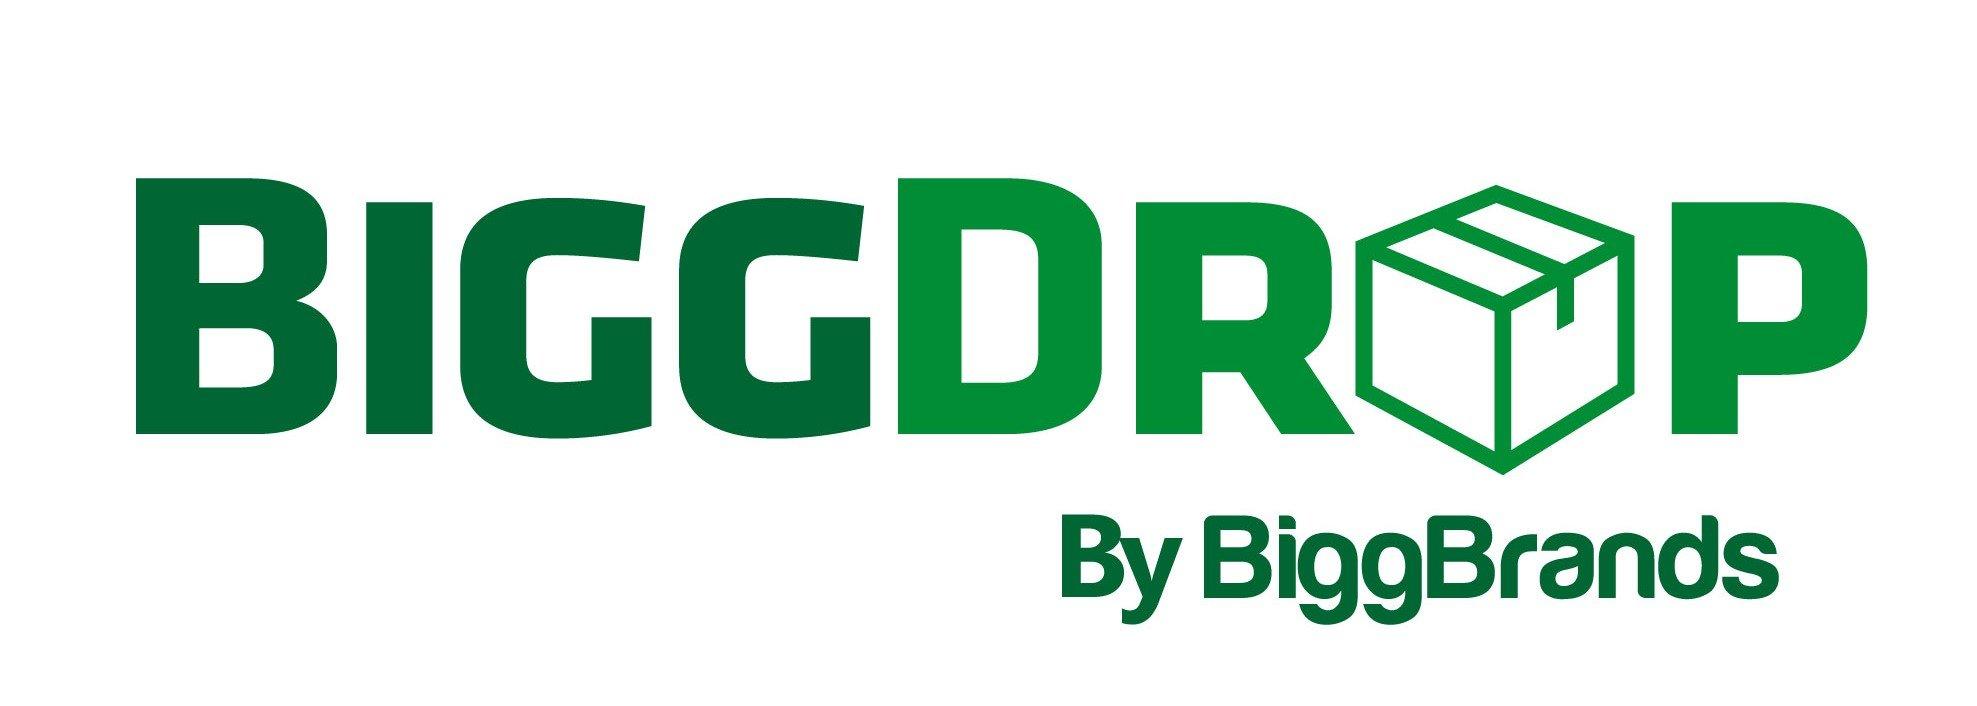 webshopimporter-biggdrop-logo